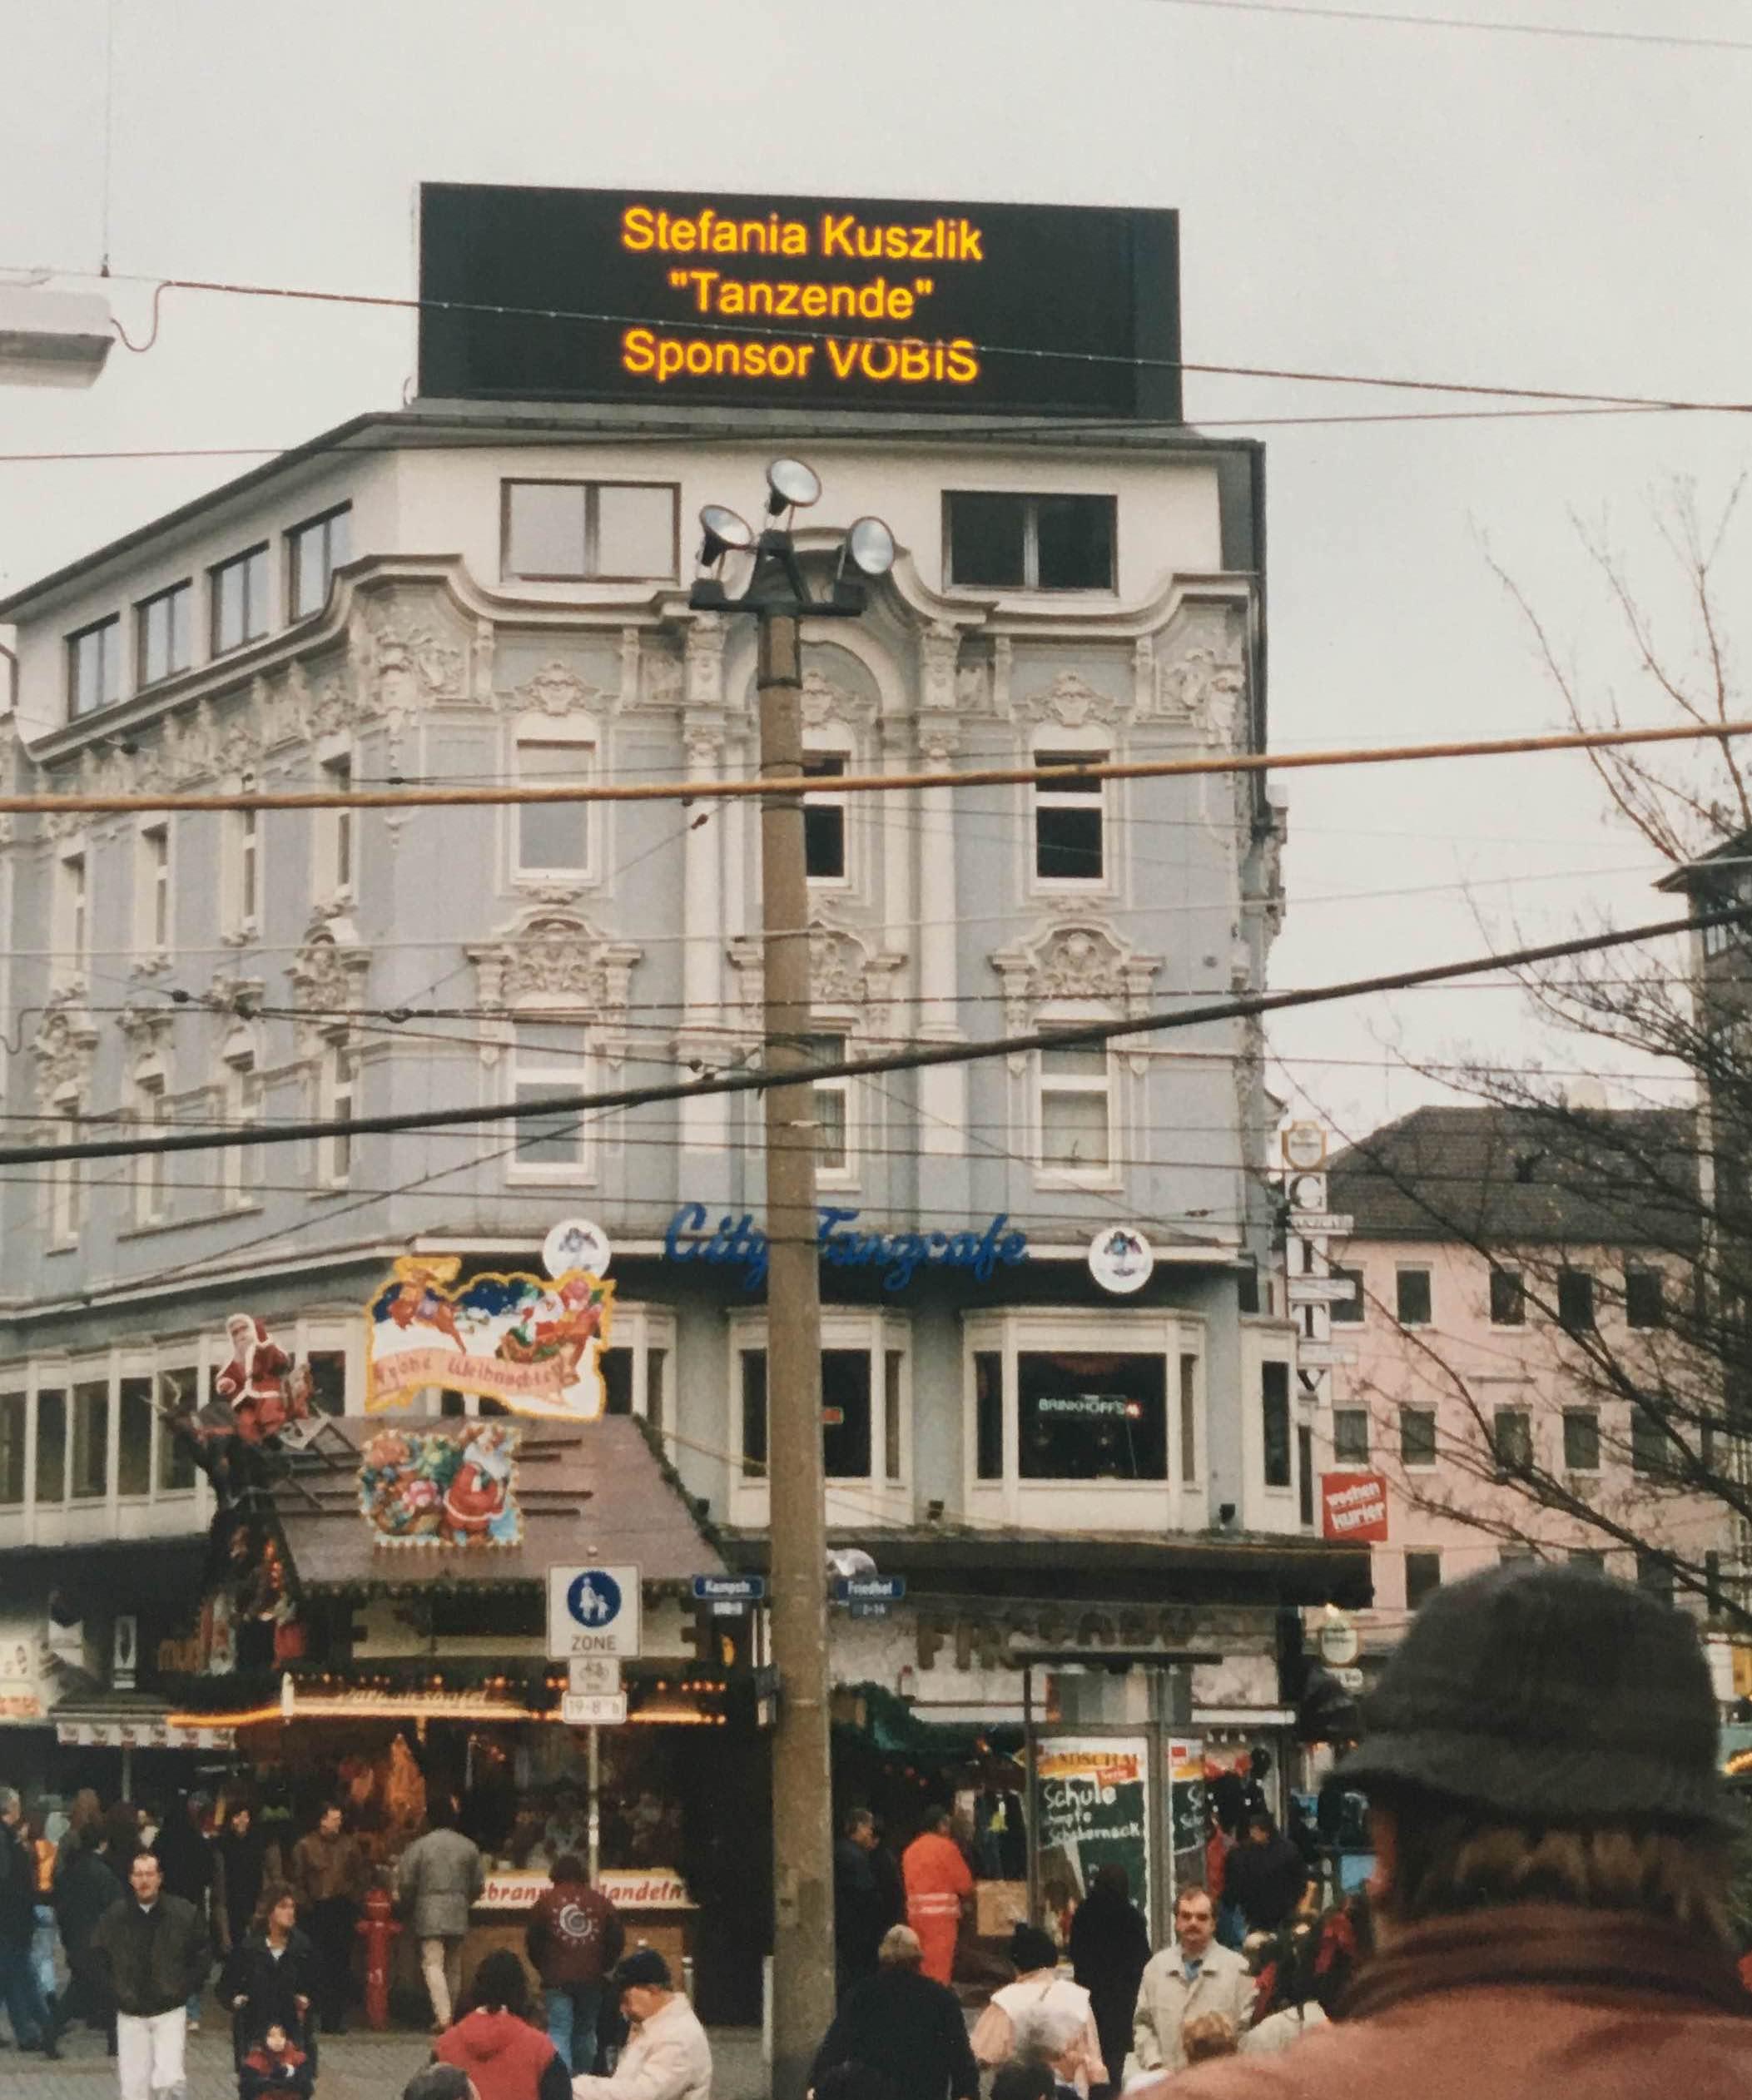 sponsor vobis, dortmund 1999